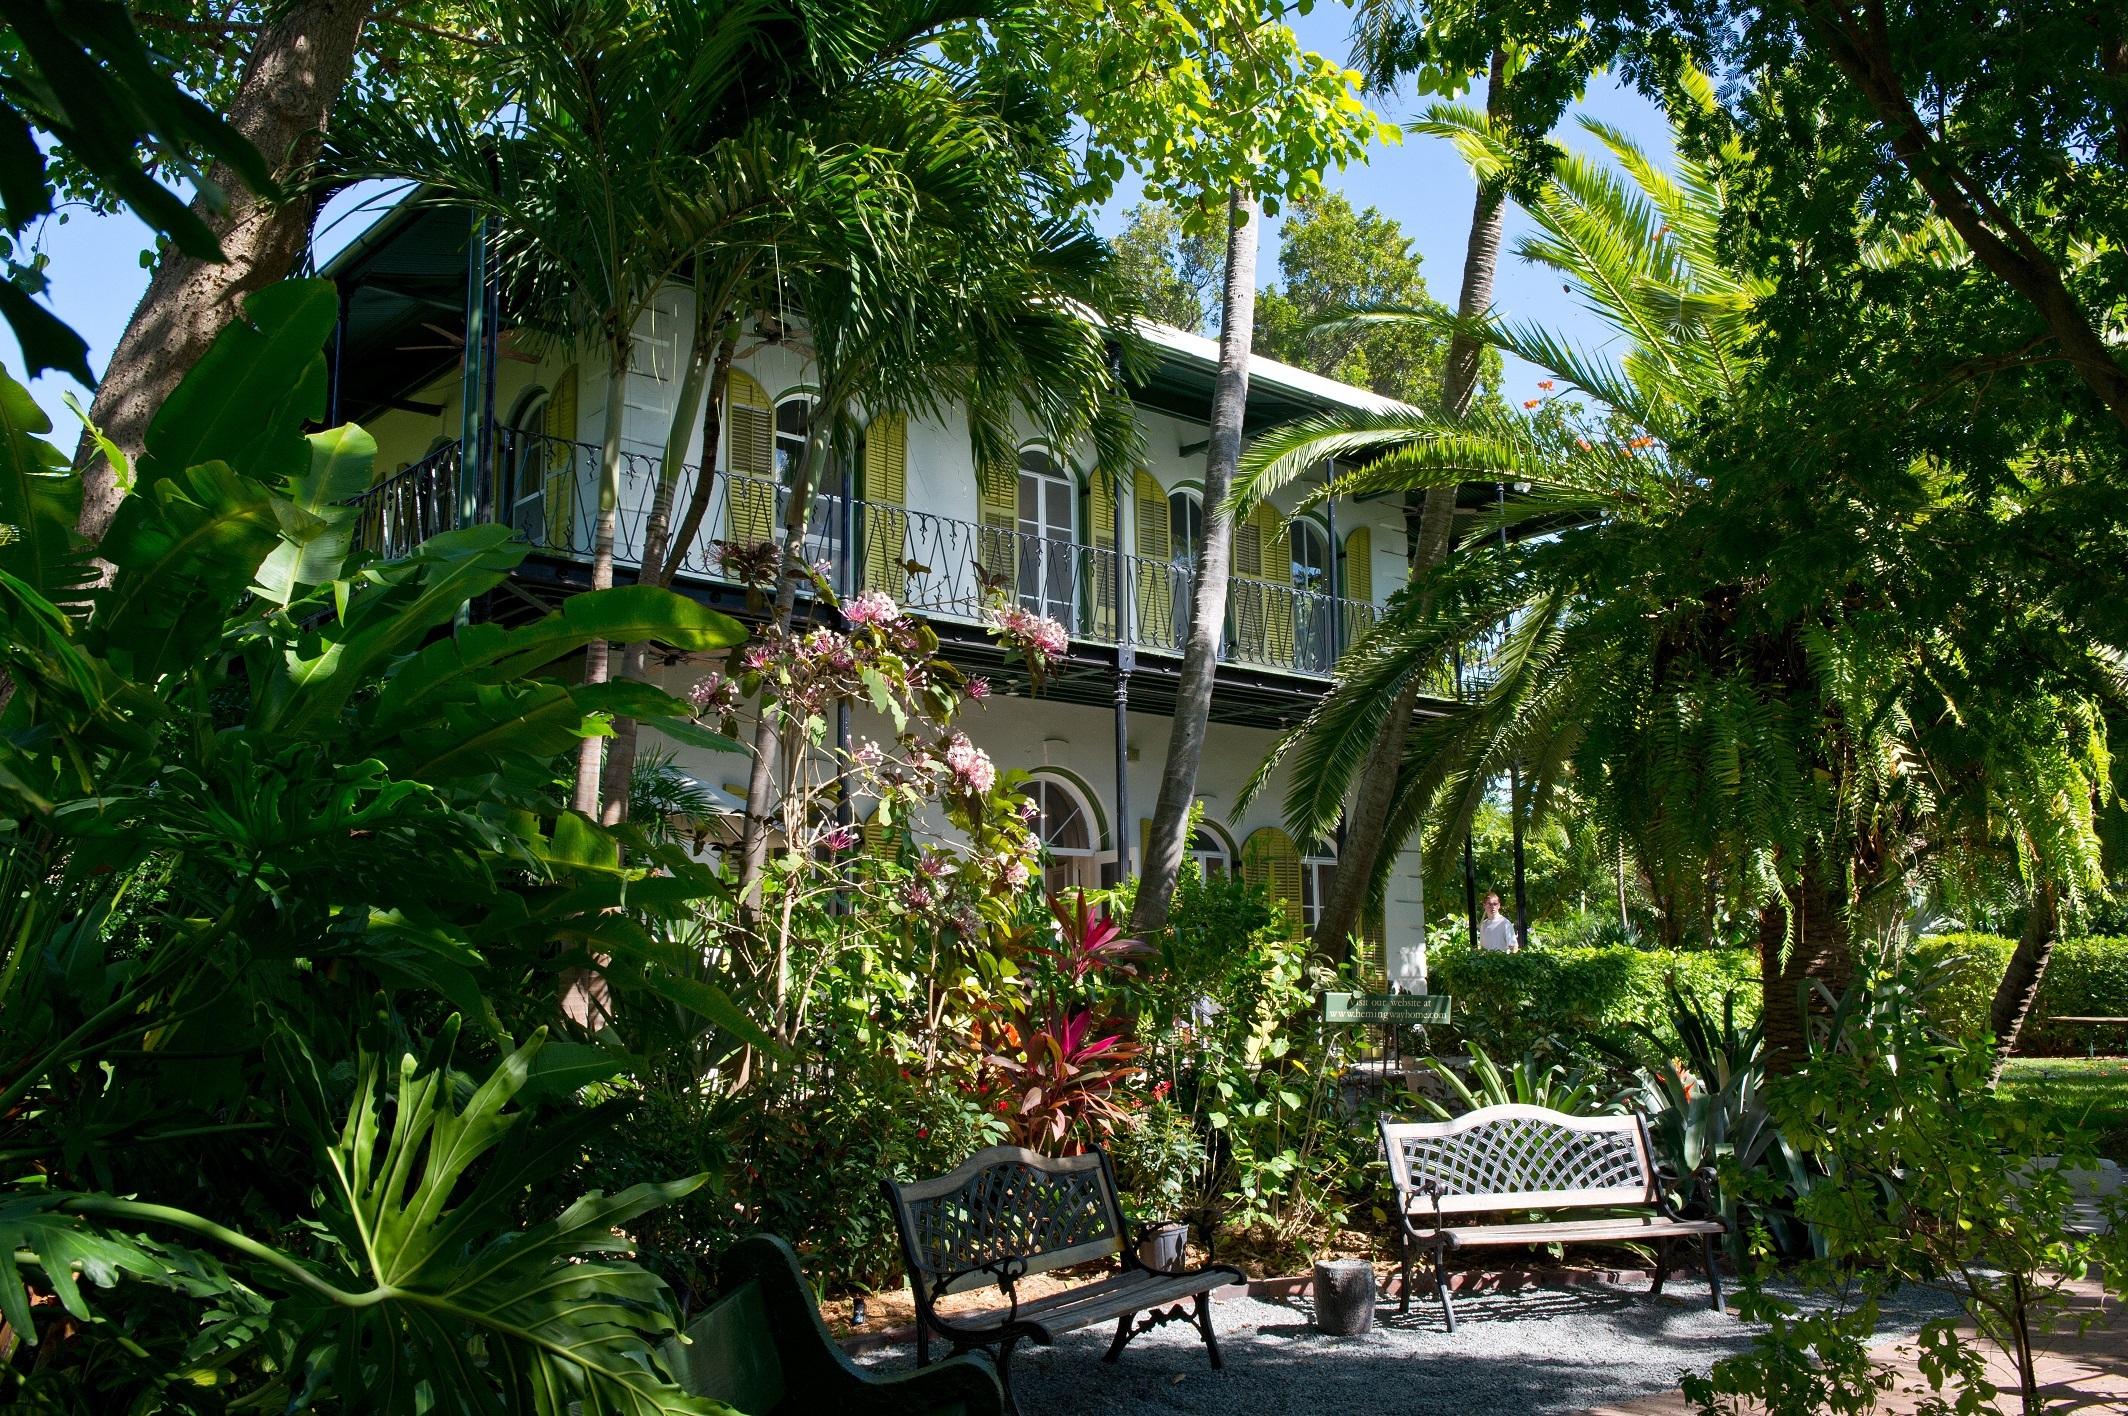 Ernest Hemingway home in Florida